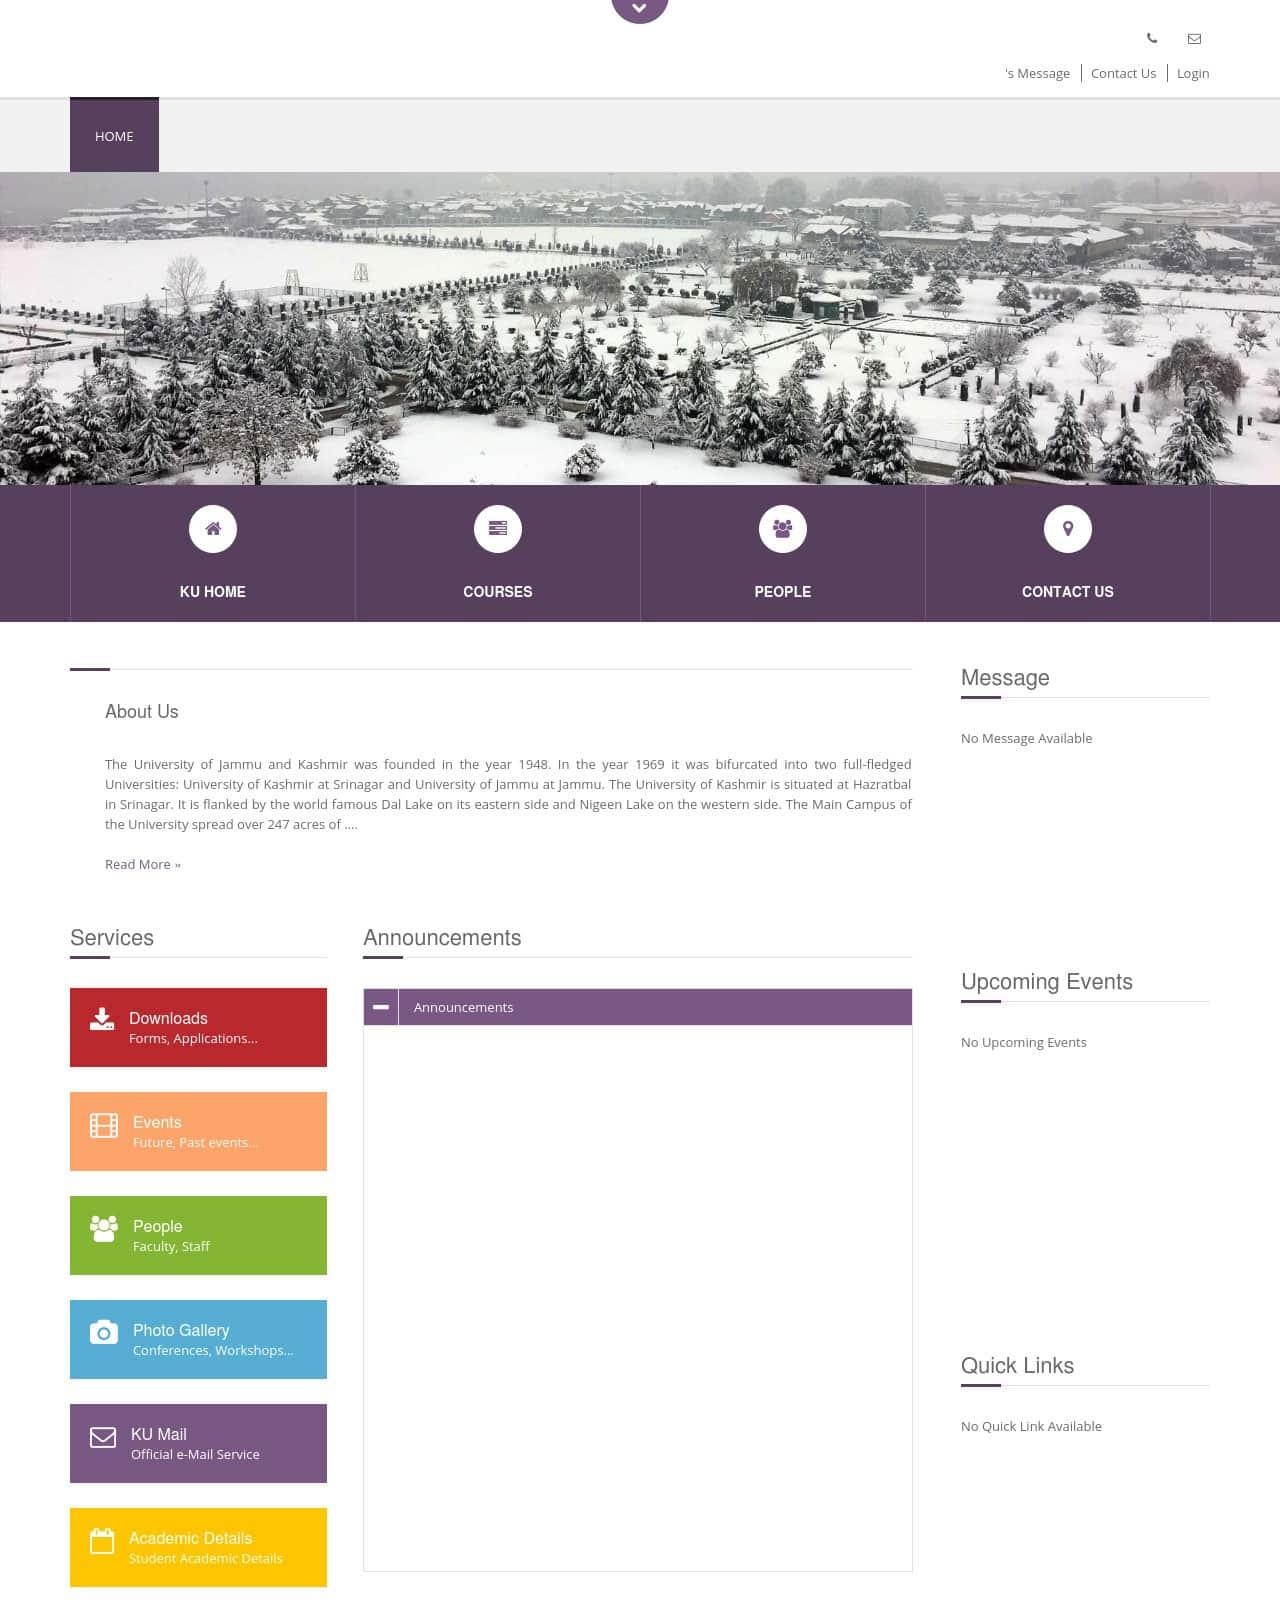 Screenshot of Directorate of Distance Education, University of Kashmir website